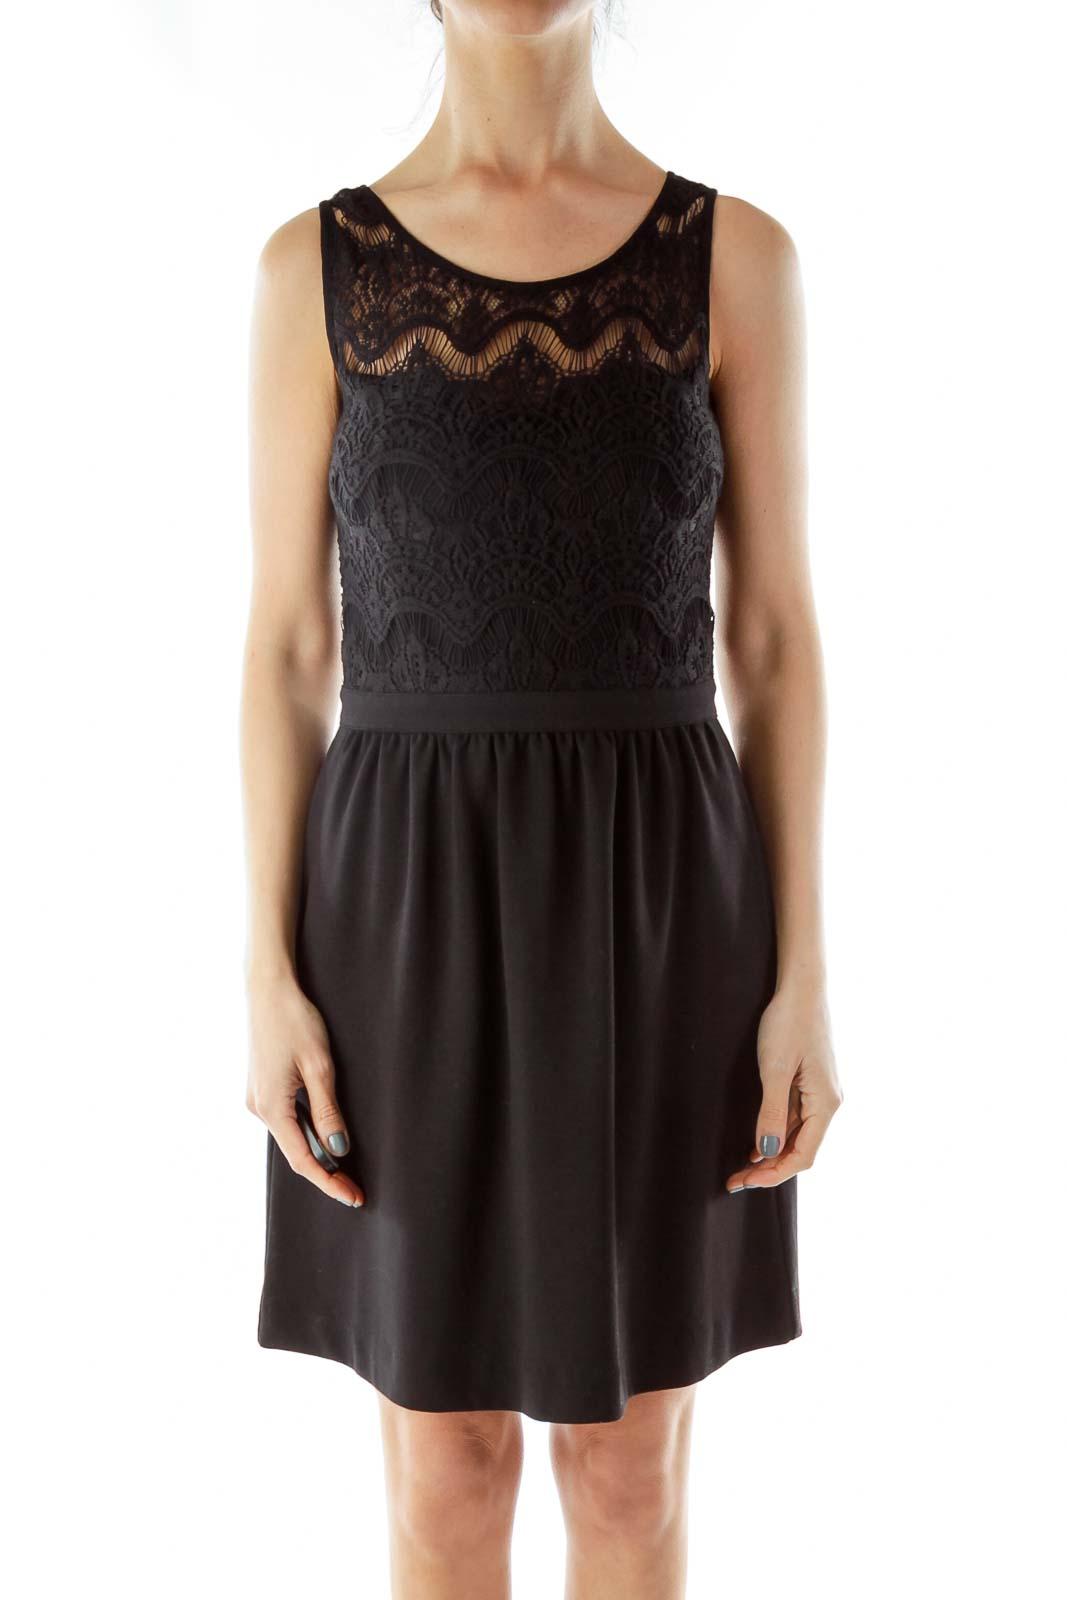 Black Lace-Bodice Cocktail Dress